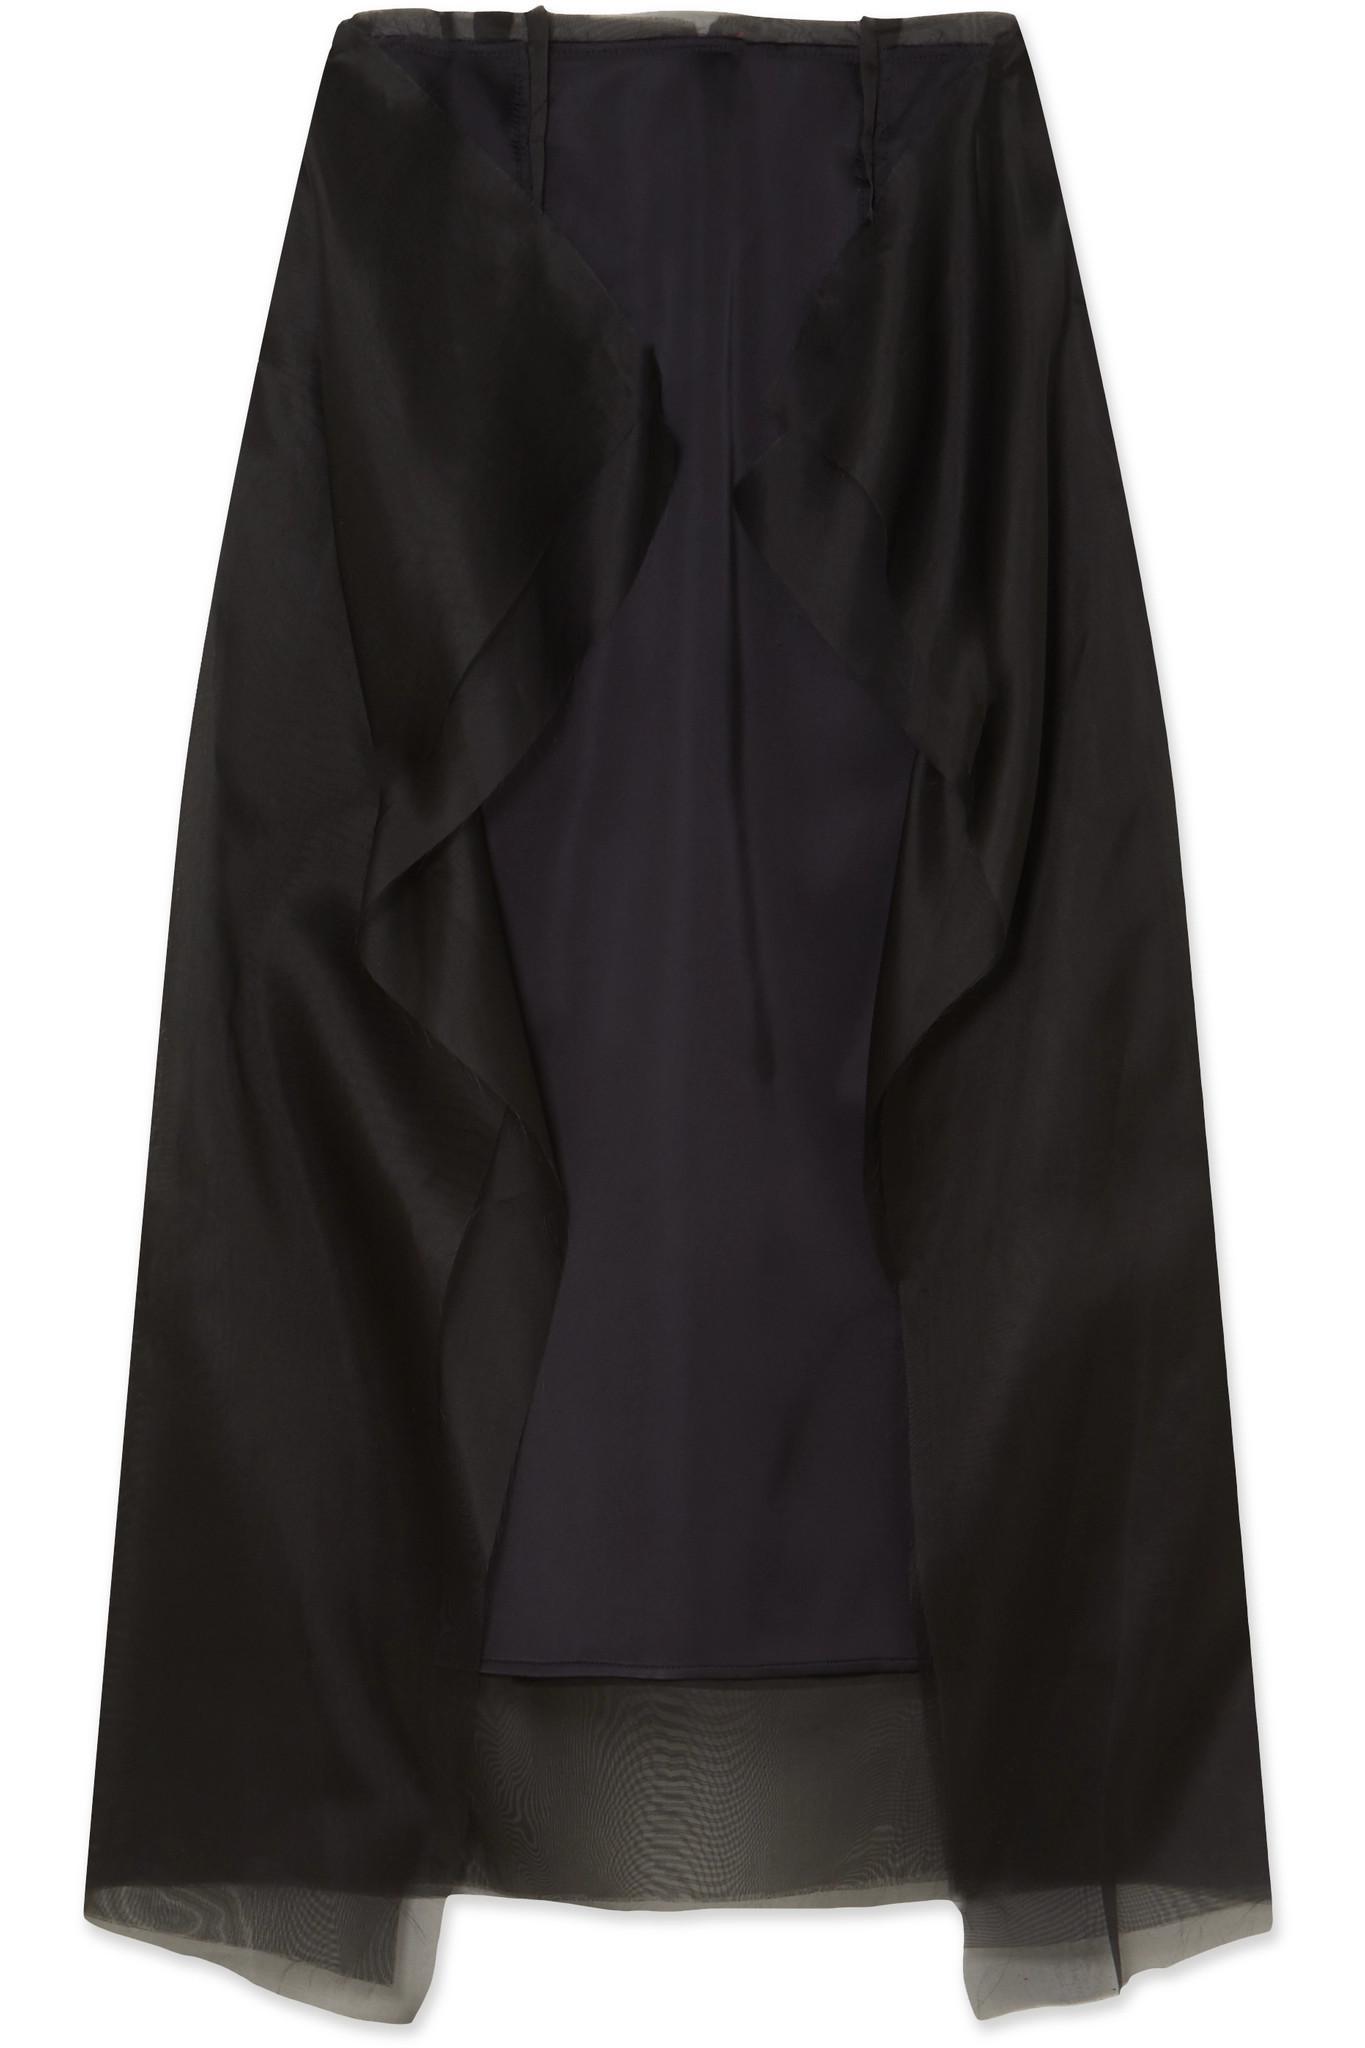 Maison Margiela. Women's Black Ruffled Satin And Silk-organza Midi Skirt